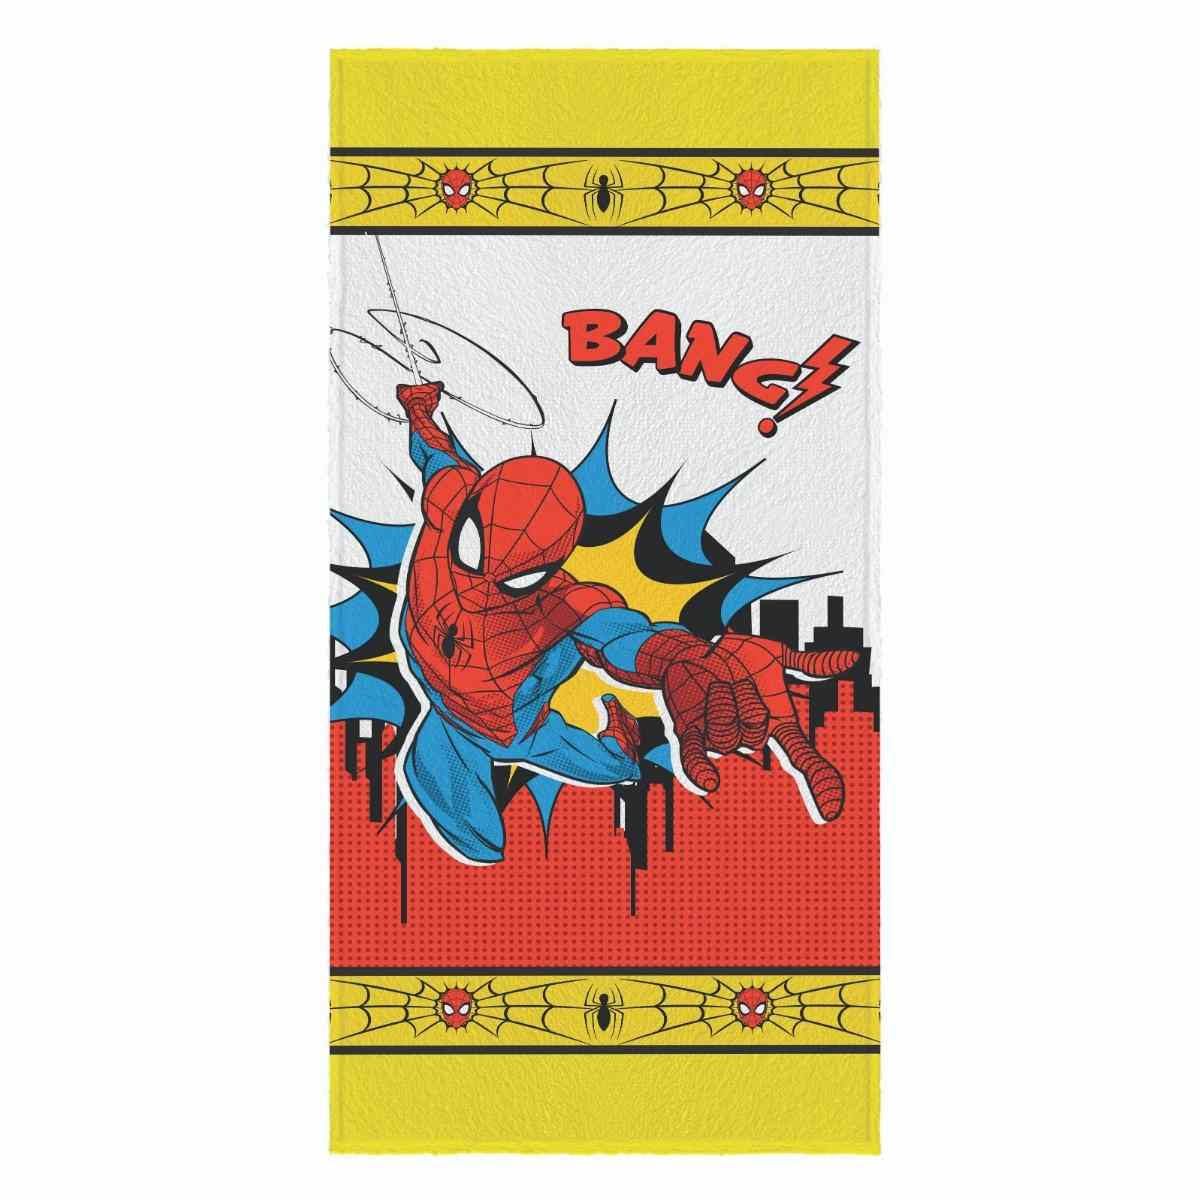 Toalha banho infantil felpuda 60x120 Spider Man Est 2